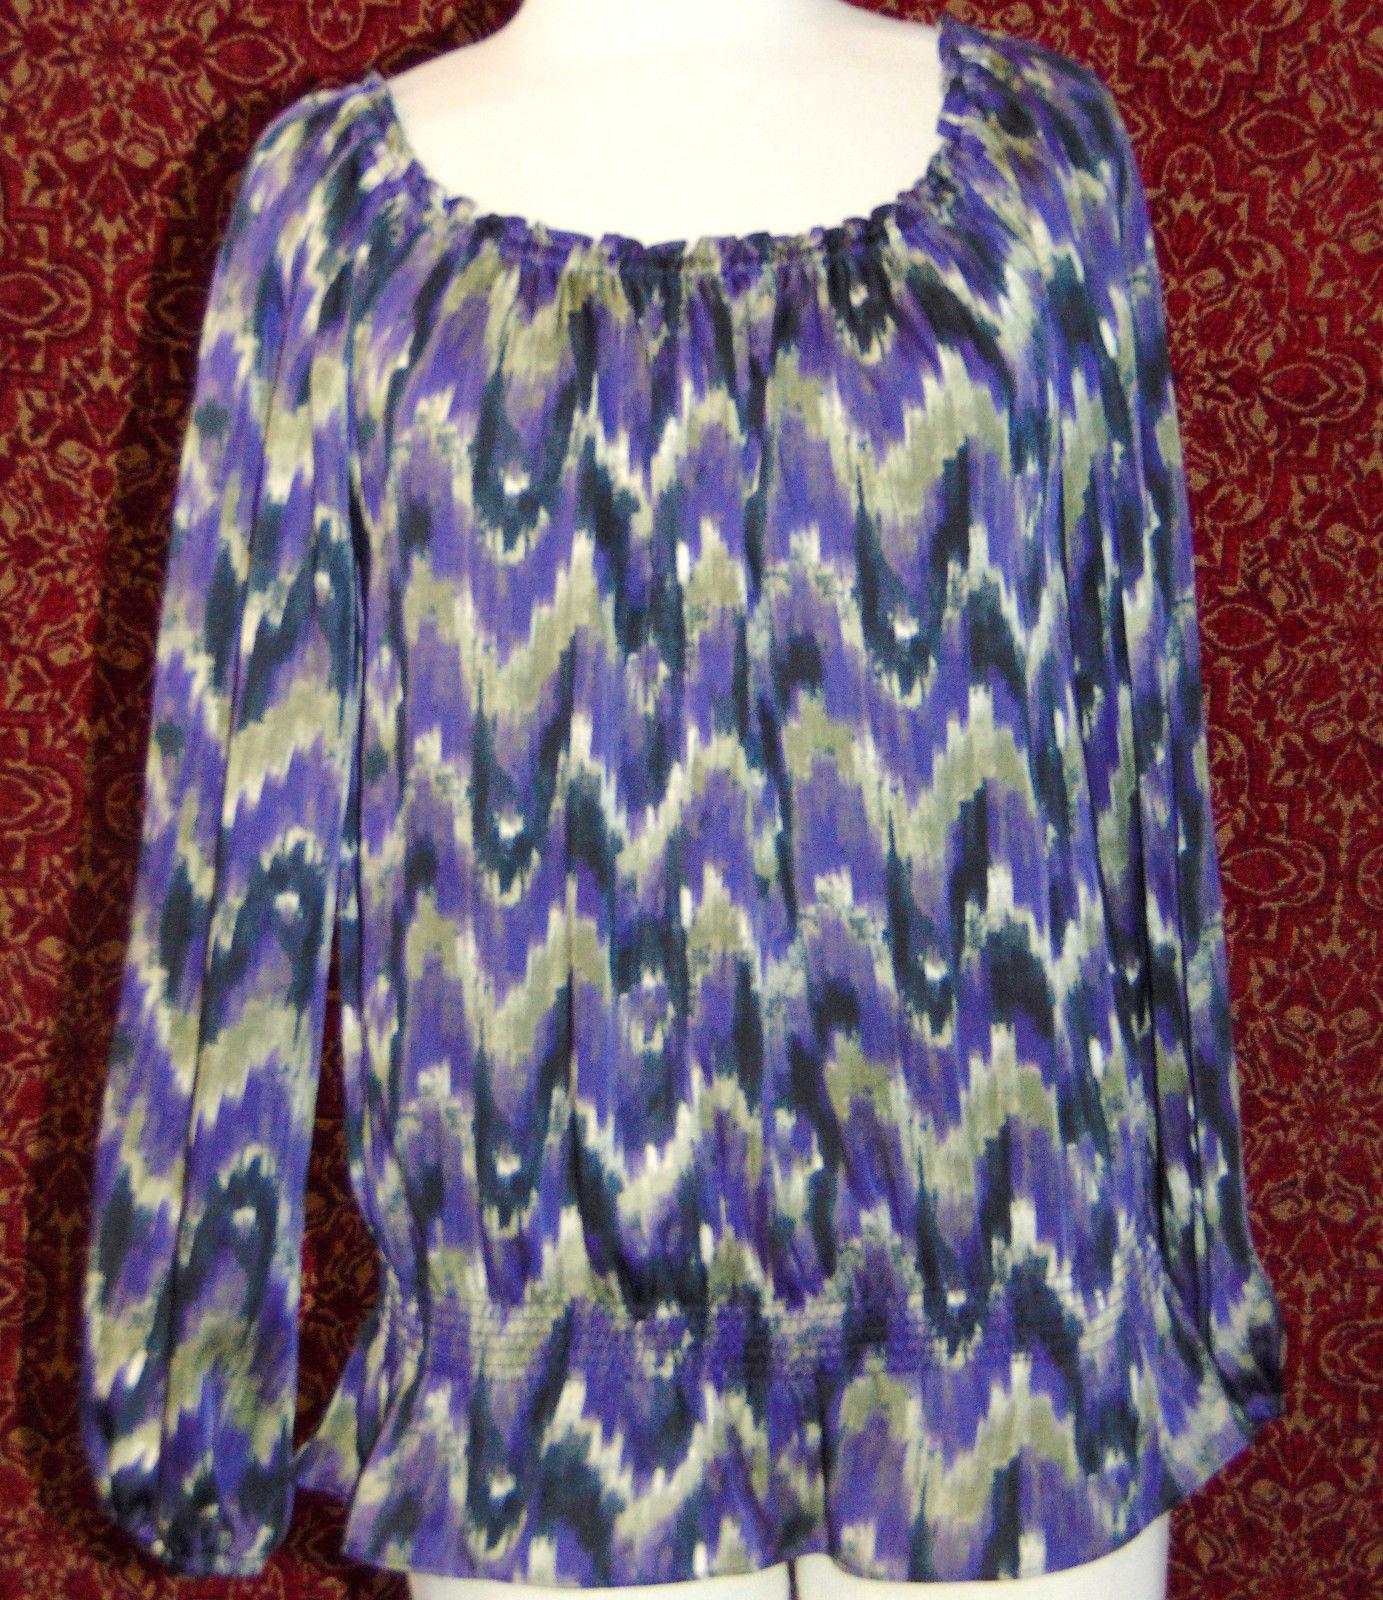 MICHAEL KORS purple polyester long sleeve blouse M (T47-01C8G) image 2